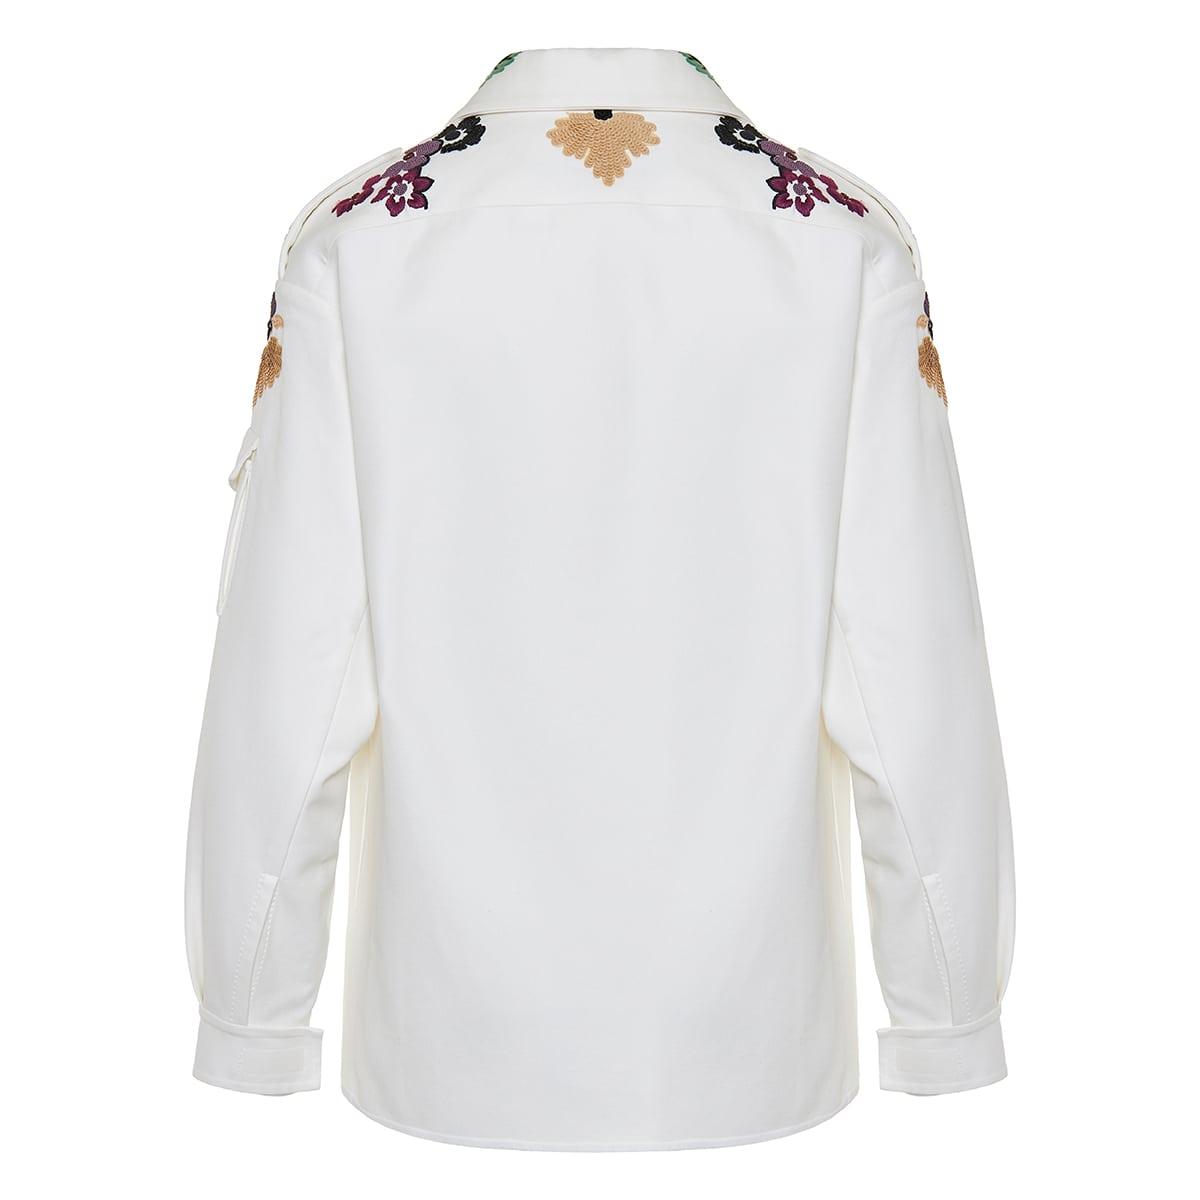 Bead-embellished cotton pea coat